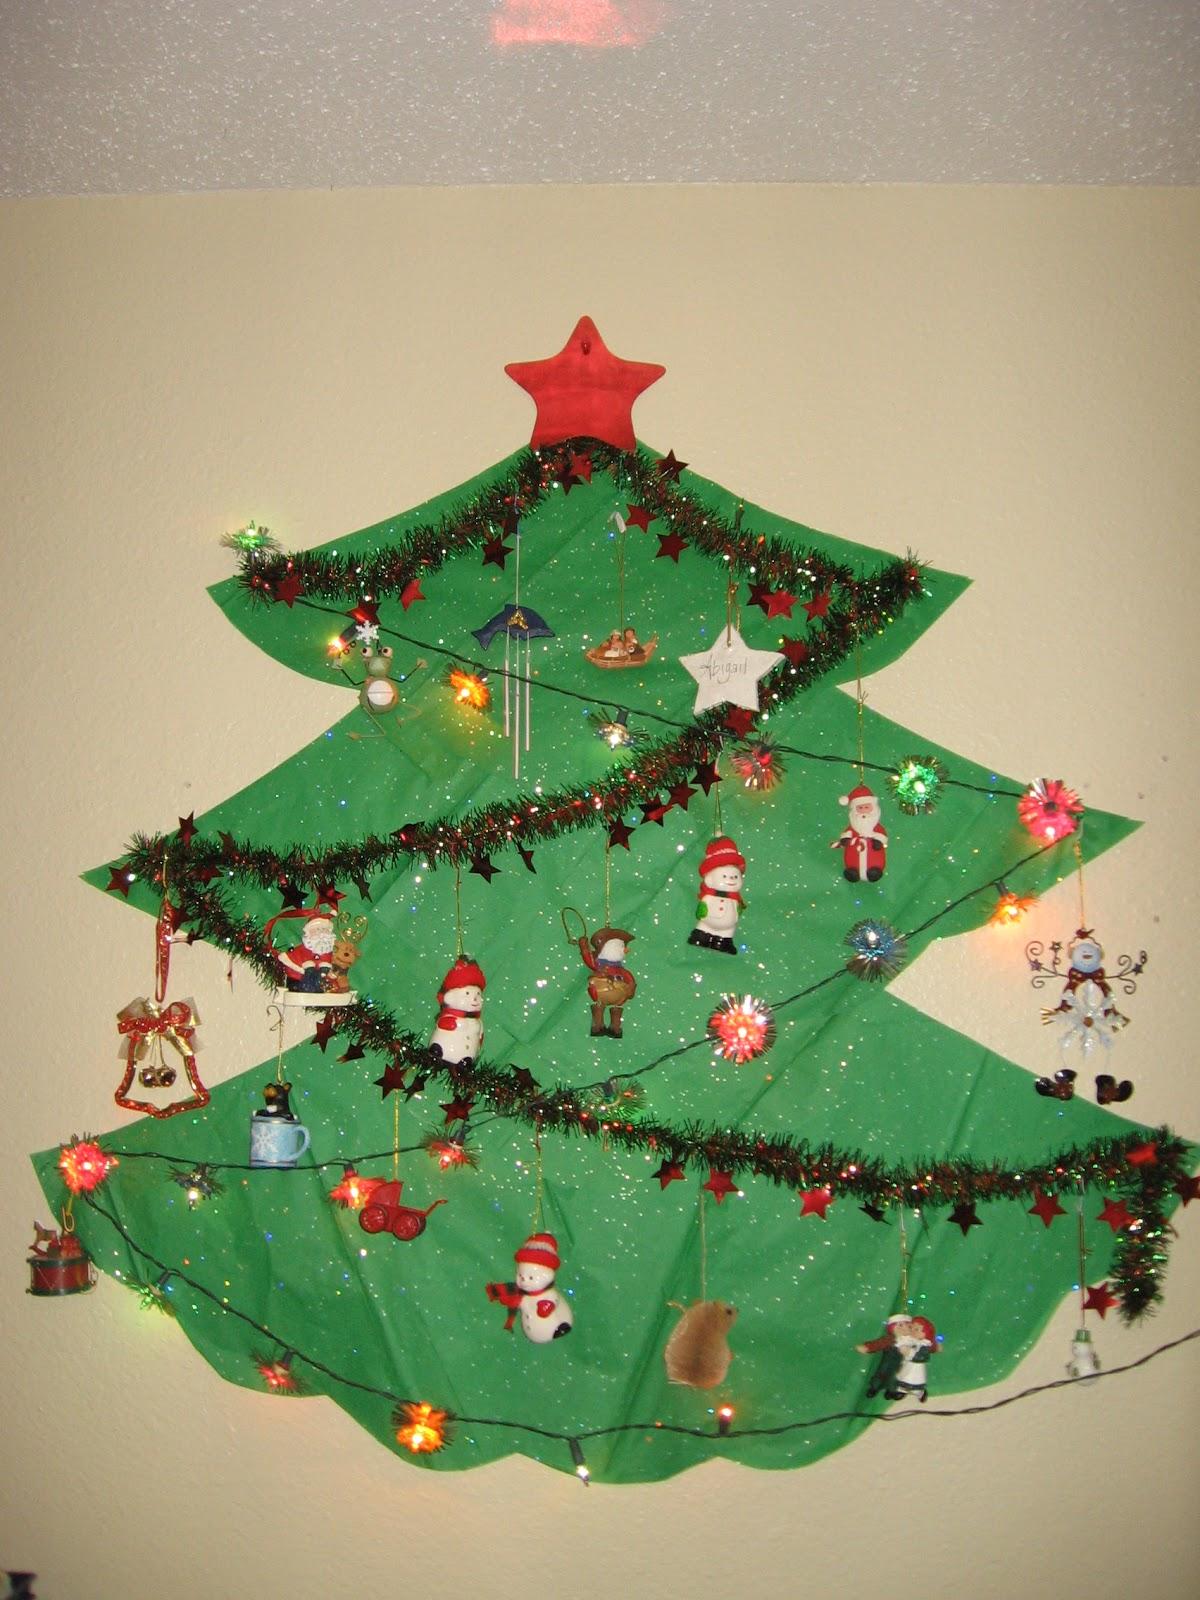 unreasonably rational: Christmas tree